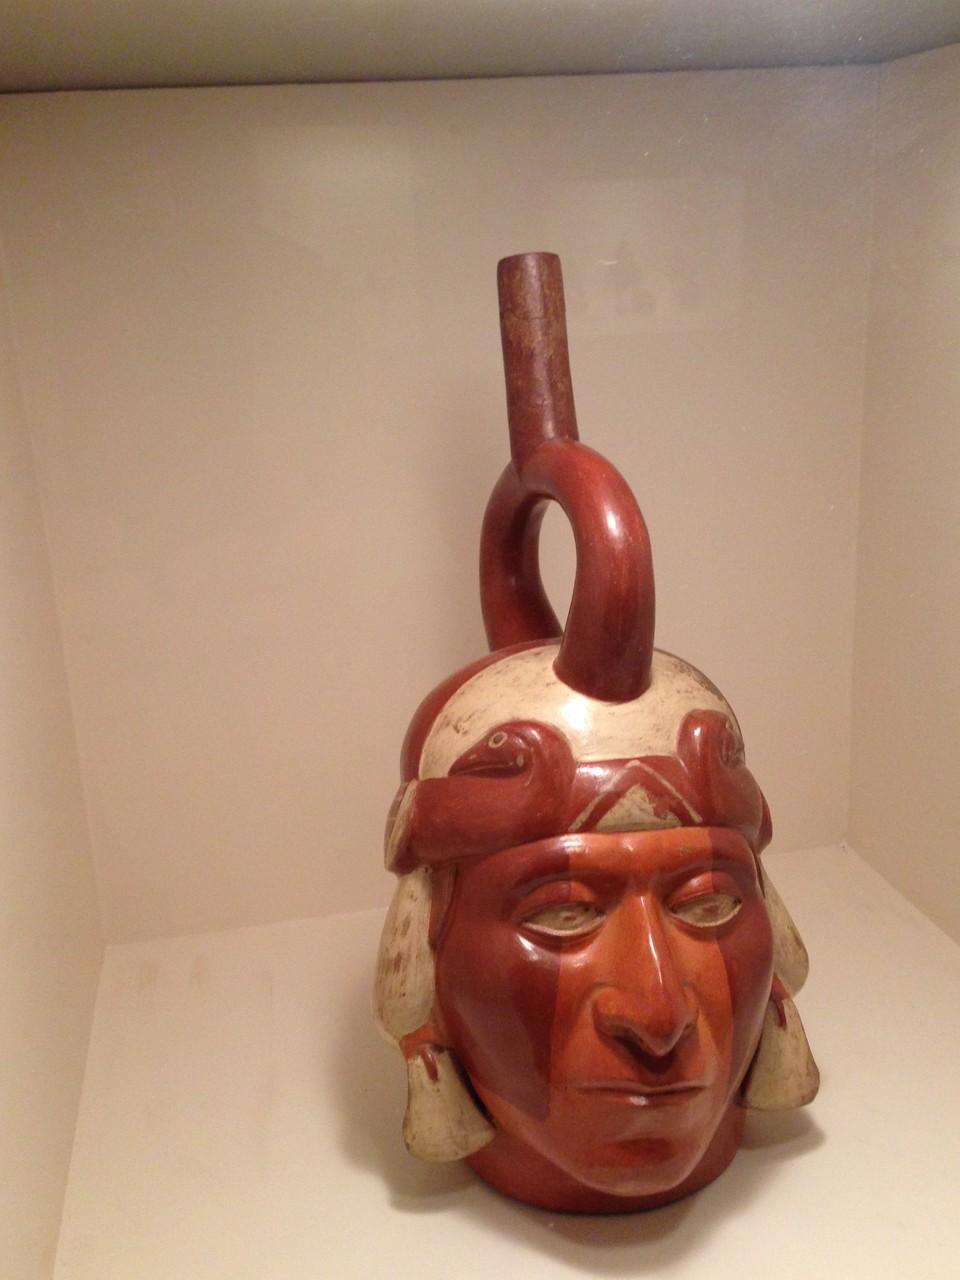 Trinkgefäße aus der Viru-Kultur